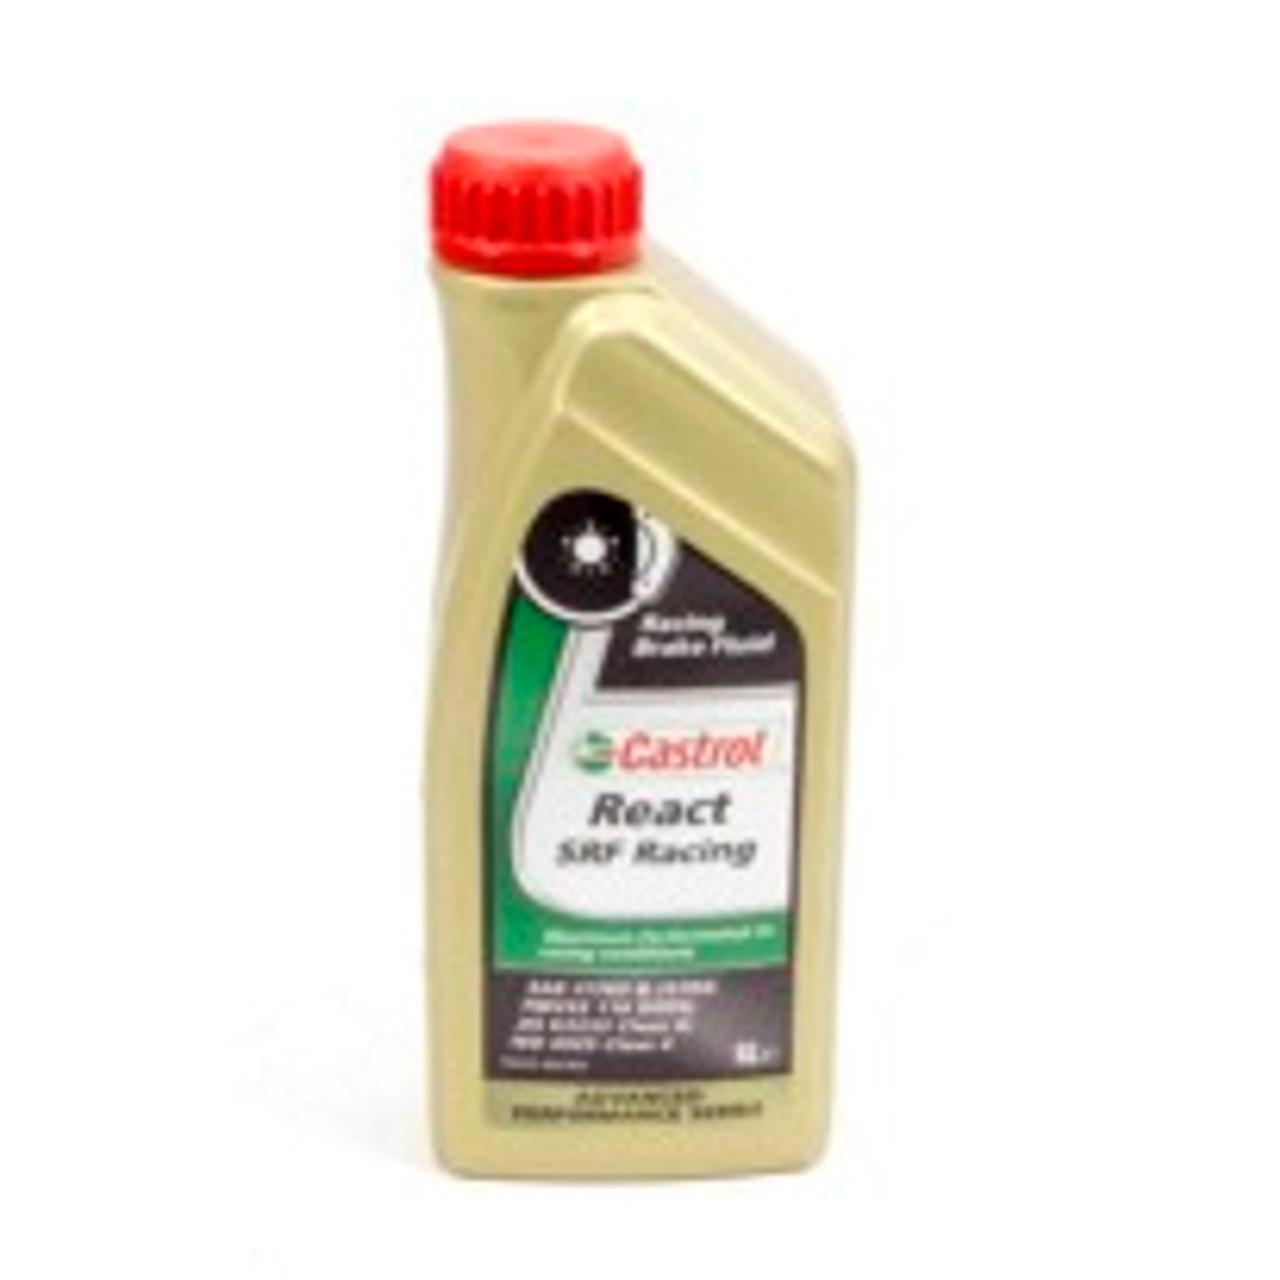 ALL78115, CASTROL,Brake Fluid, Castrol SRF React, DOT 4, 33.8 oz,